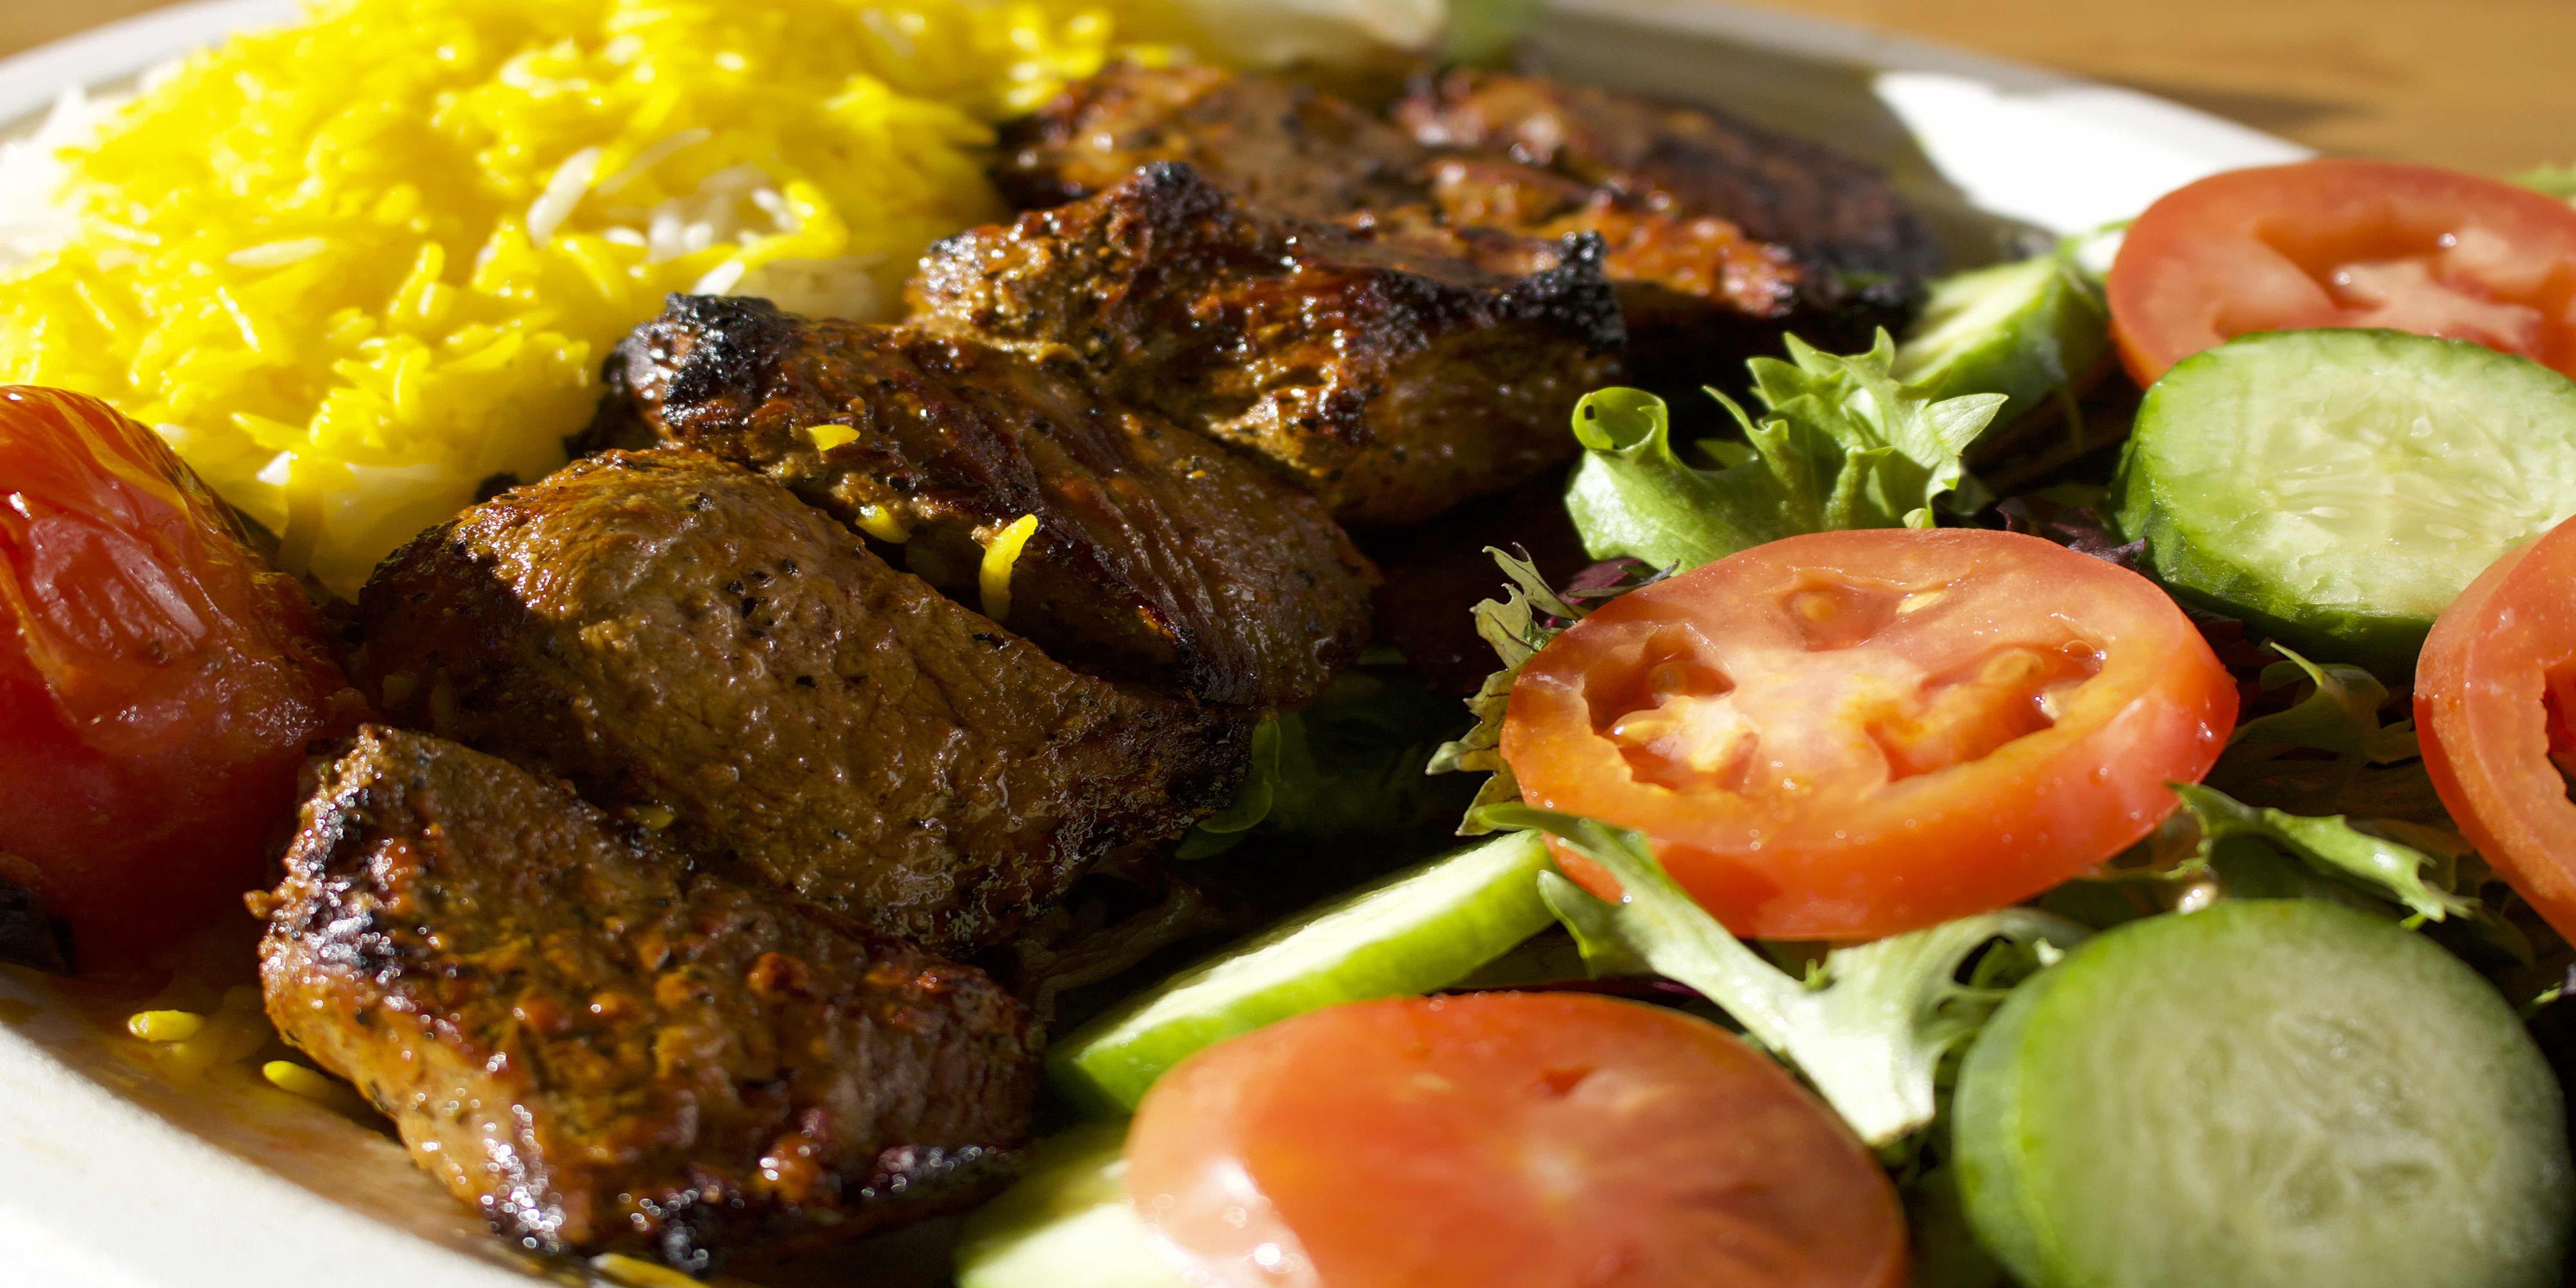 36.Shish Kebab